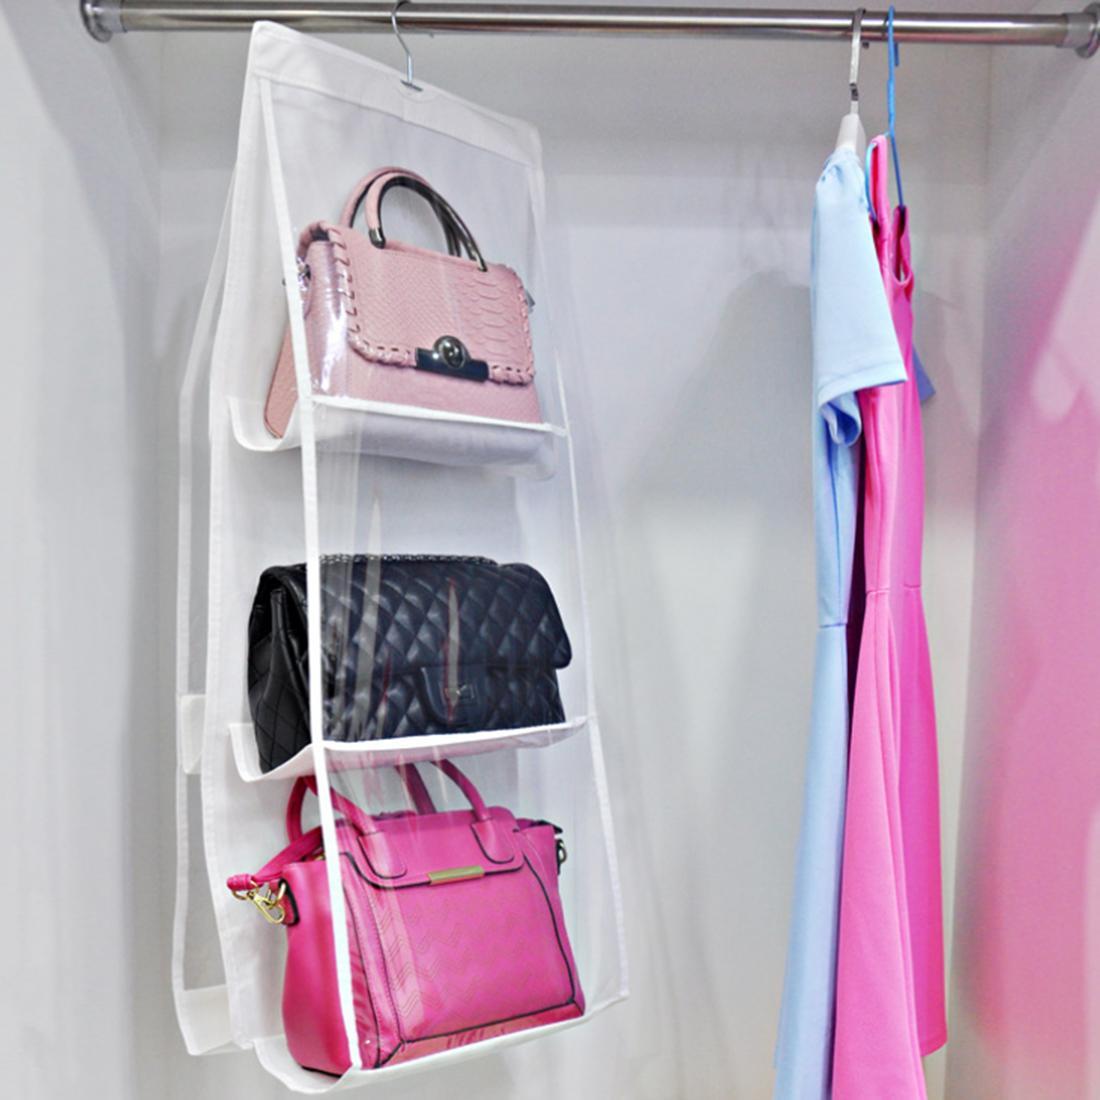 360DSC 6 Pockets Hanging Handbag Purse Bag Tidy Organizer StorageWardrobe Closet Hanger - White